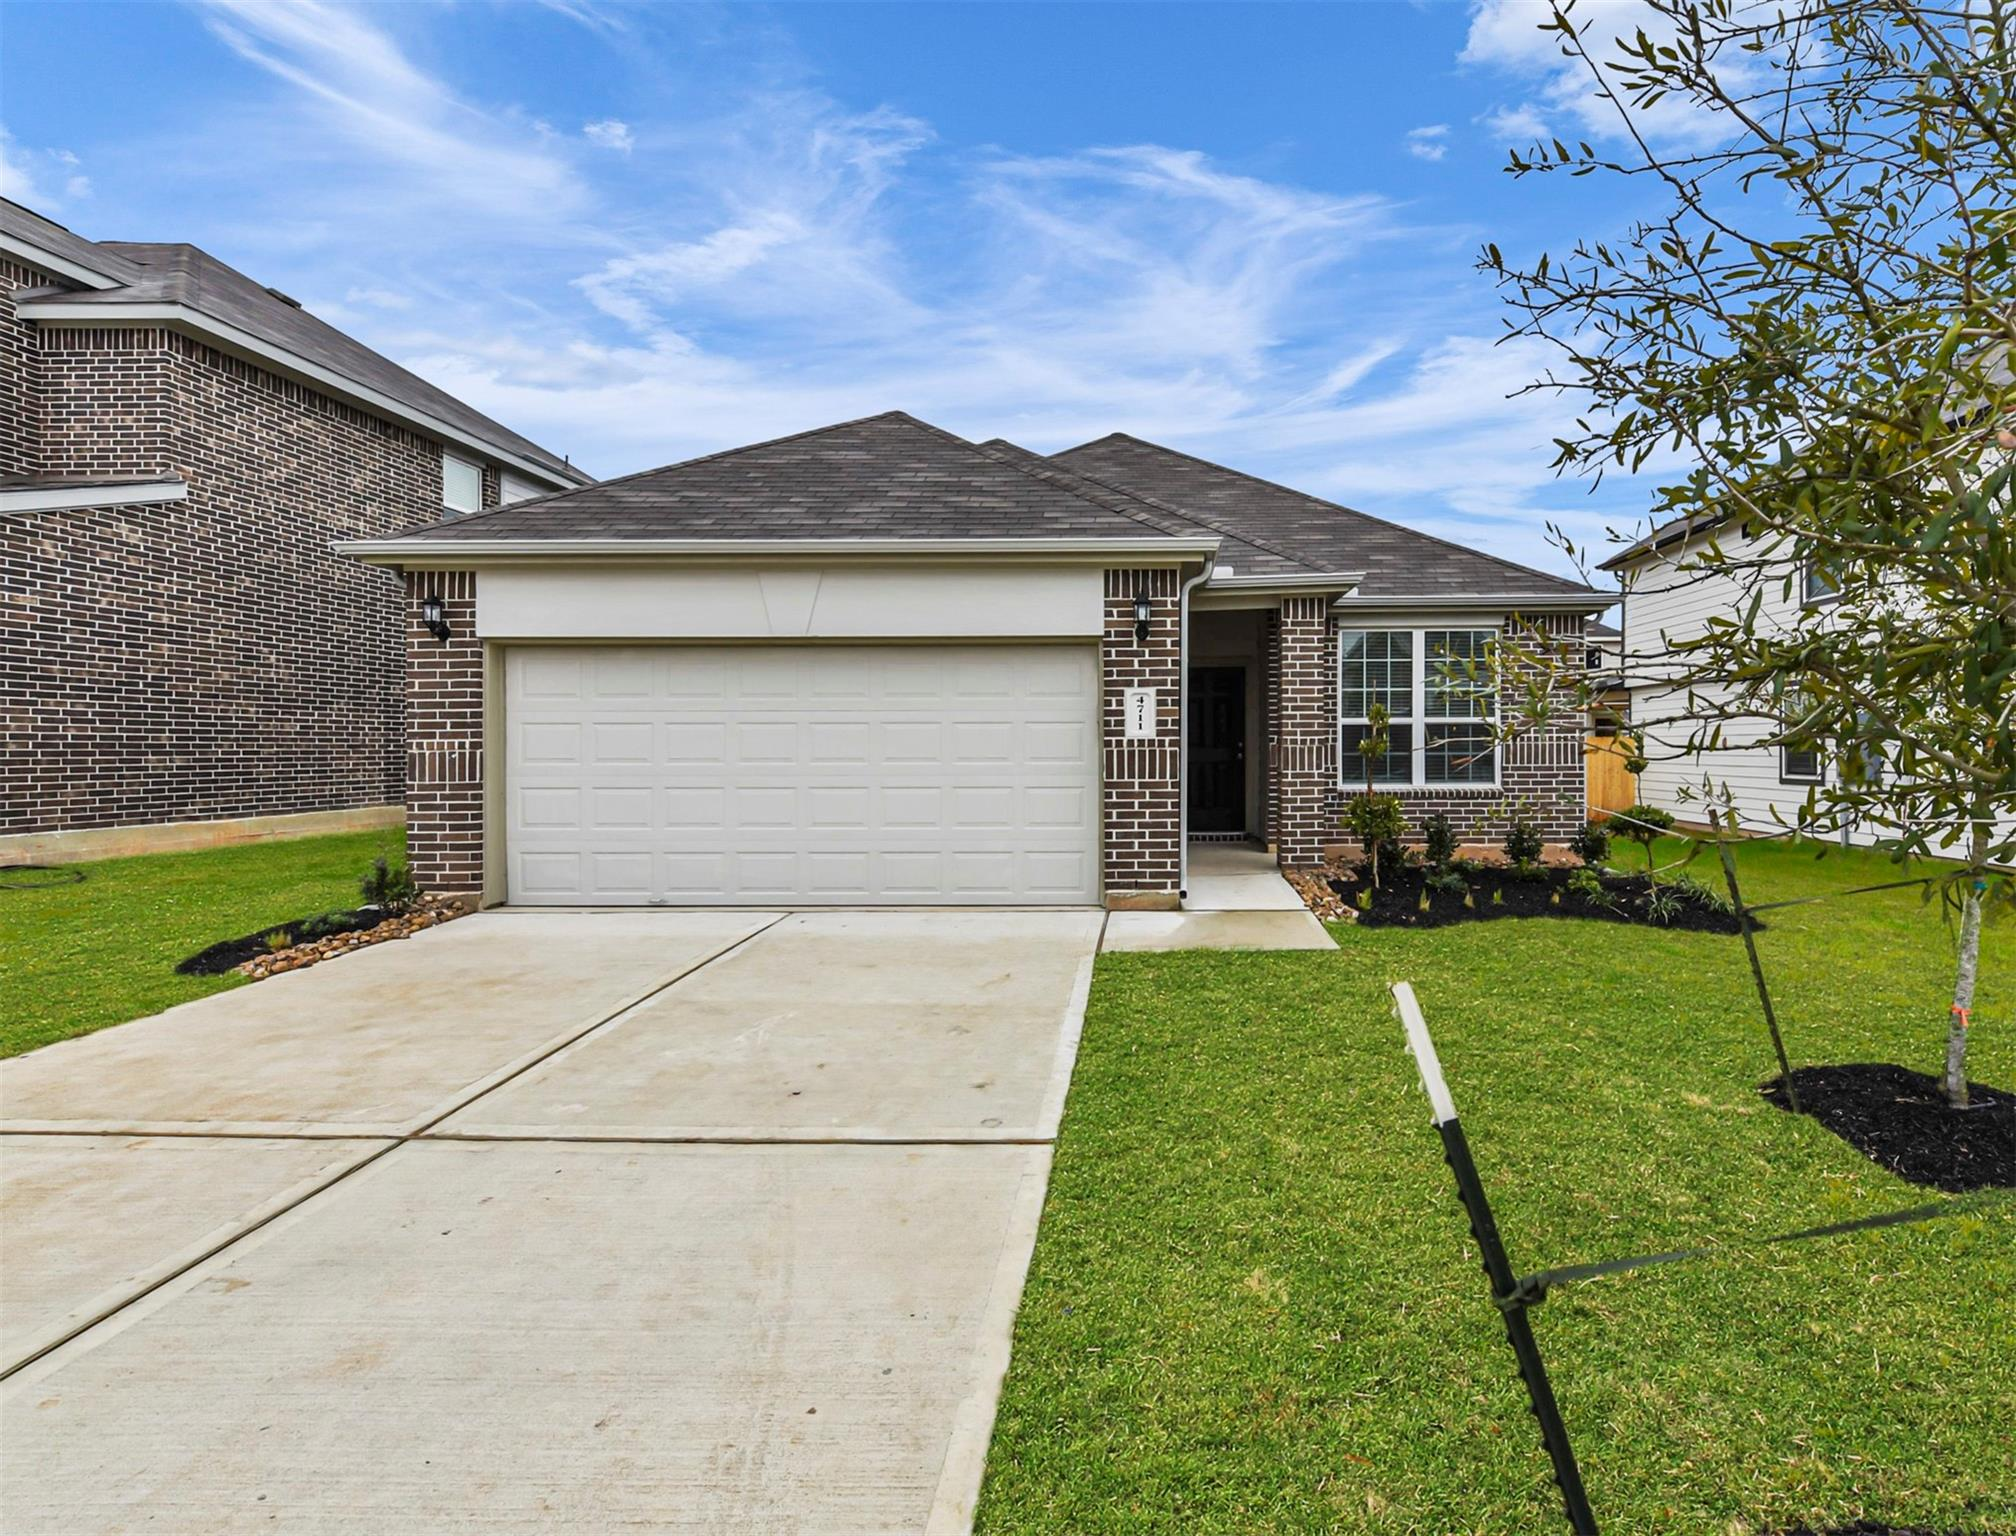 4711 Coyotillo Way Property Photo - Bryan, TX real estate listing